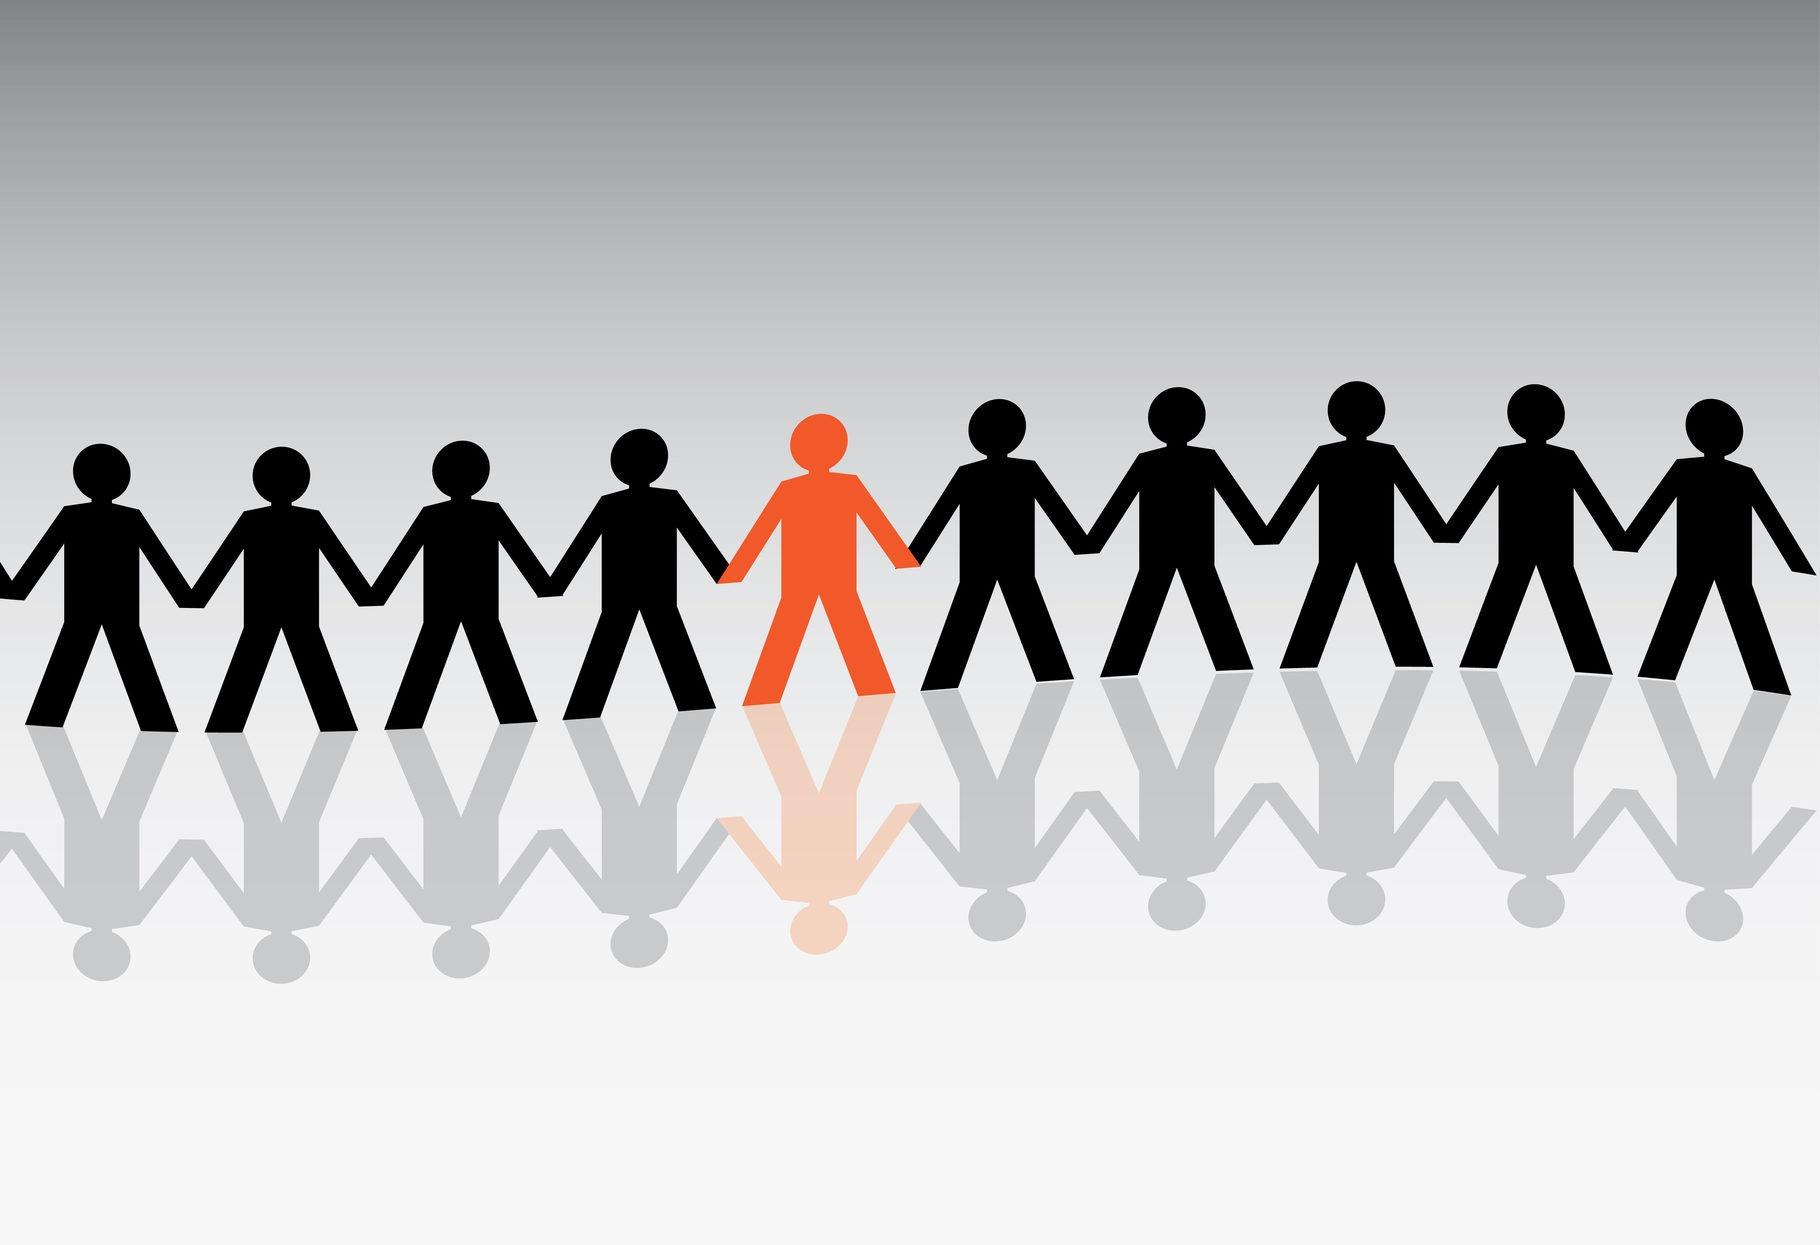 menschenkette, berufsgenossenschaft, genossenschaft, sozialrecht, betrieb, betriebsrat, arbeitsrecht, Kanzlei, Anwalt